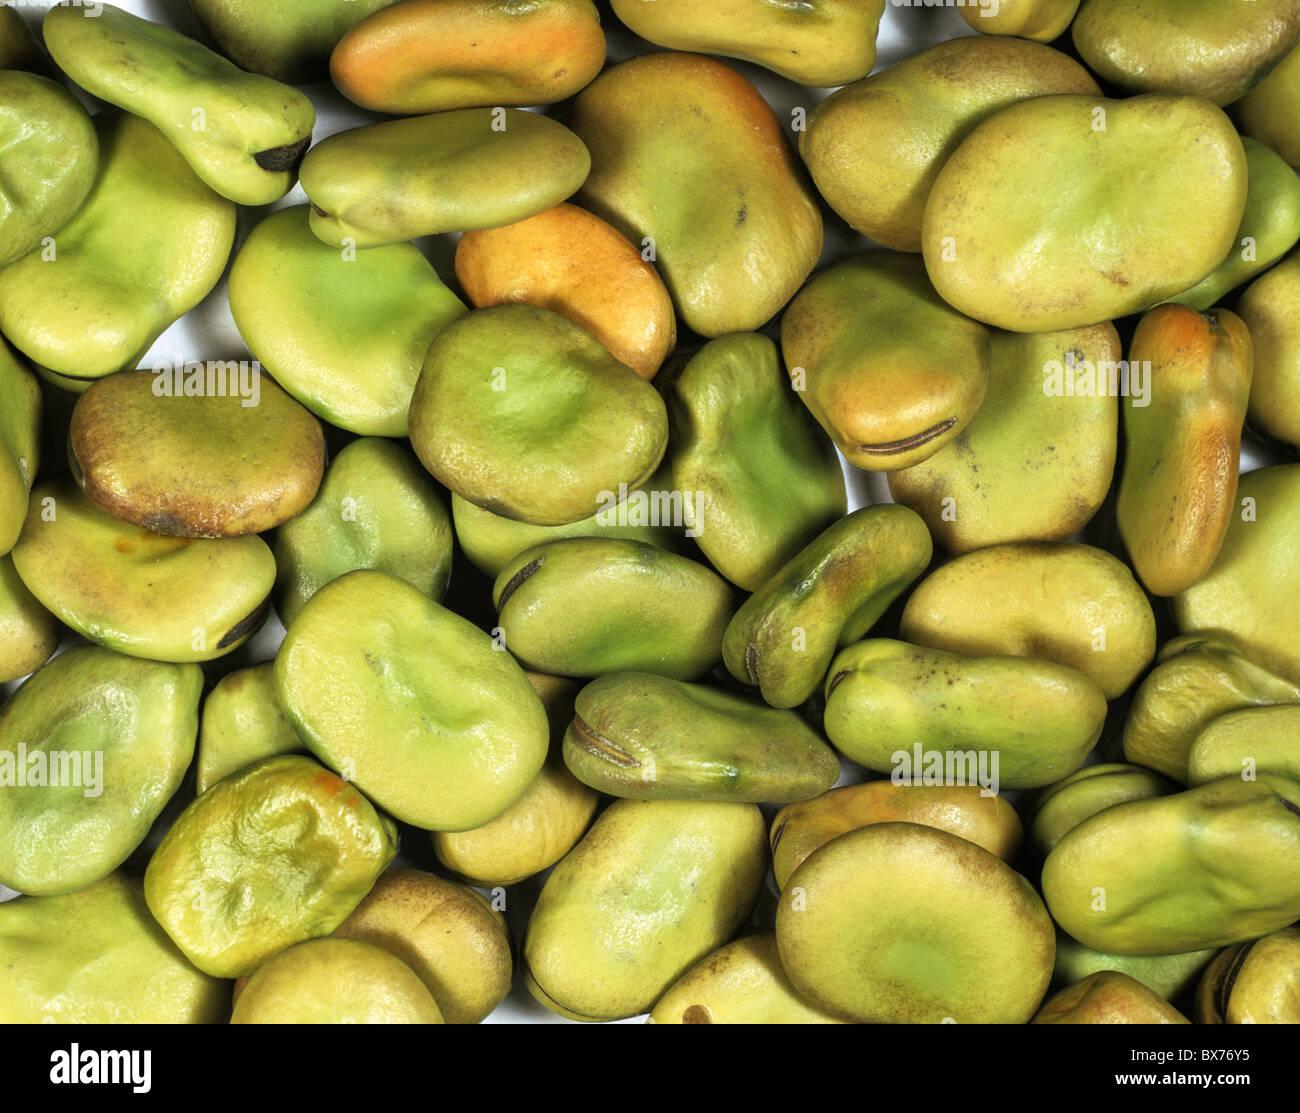 Graines de fève (Vicia faba) Photo Stock